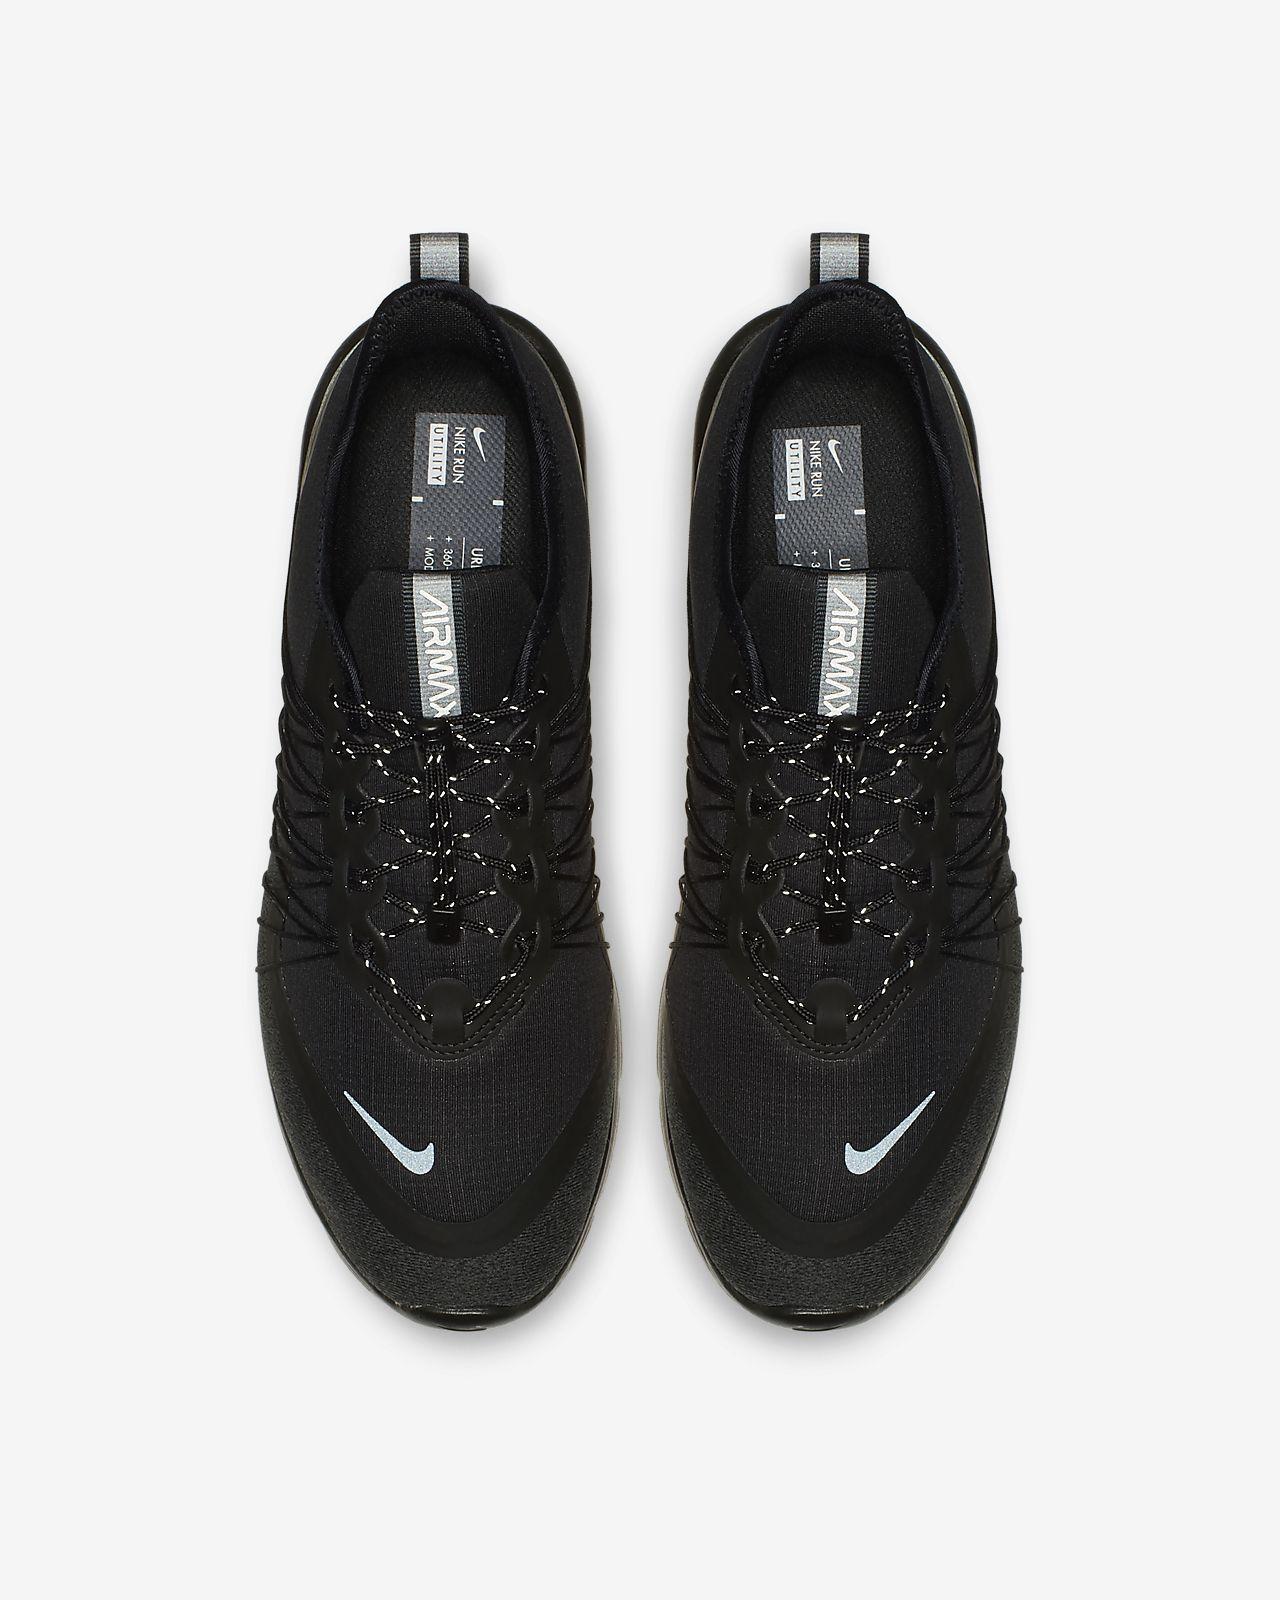 16f0cf4f2ea5a5 Nike Air Max Sequent 4 Utility Women s Shoe. Nike.com CA